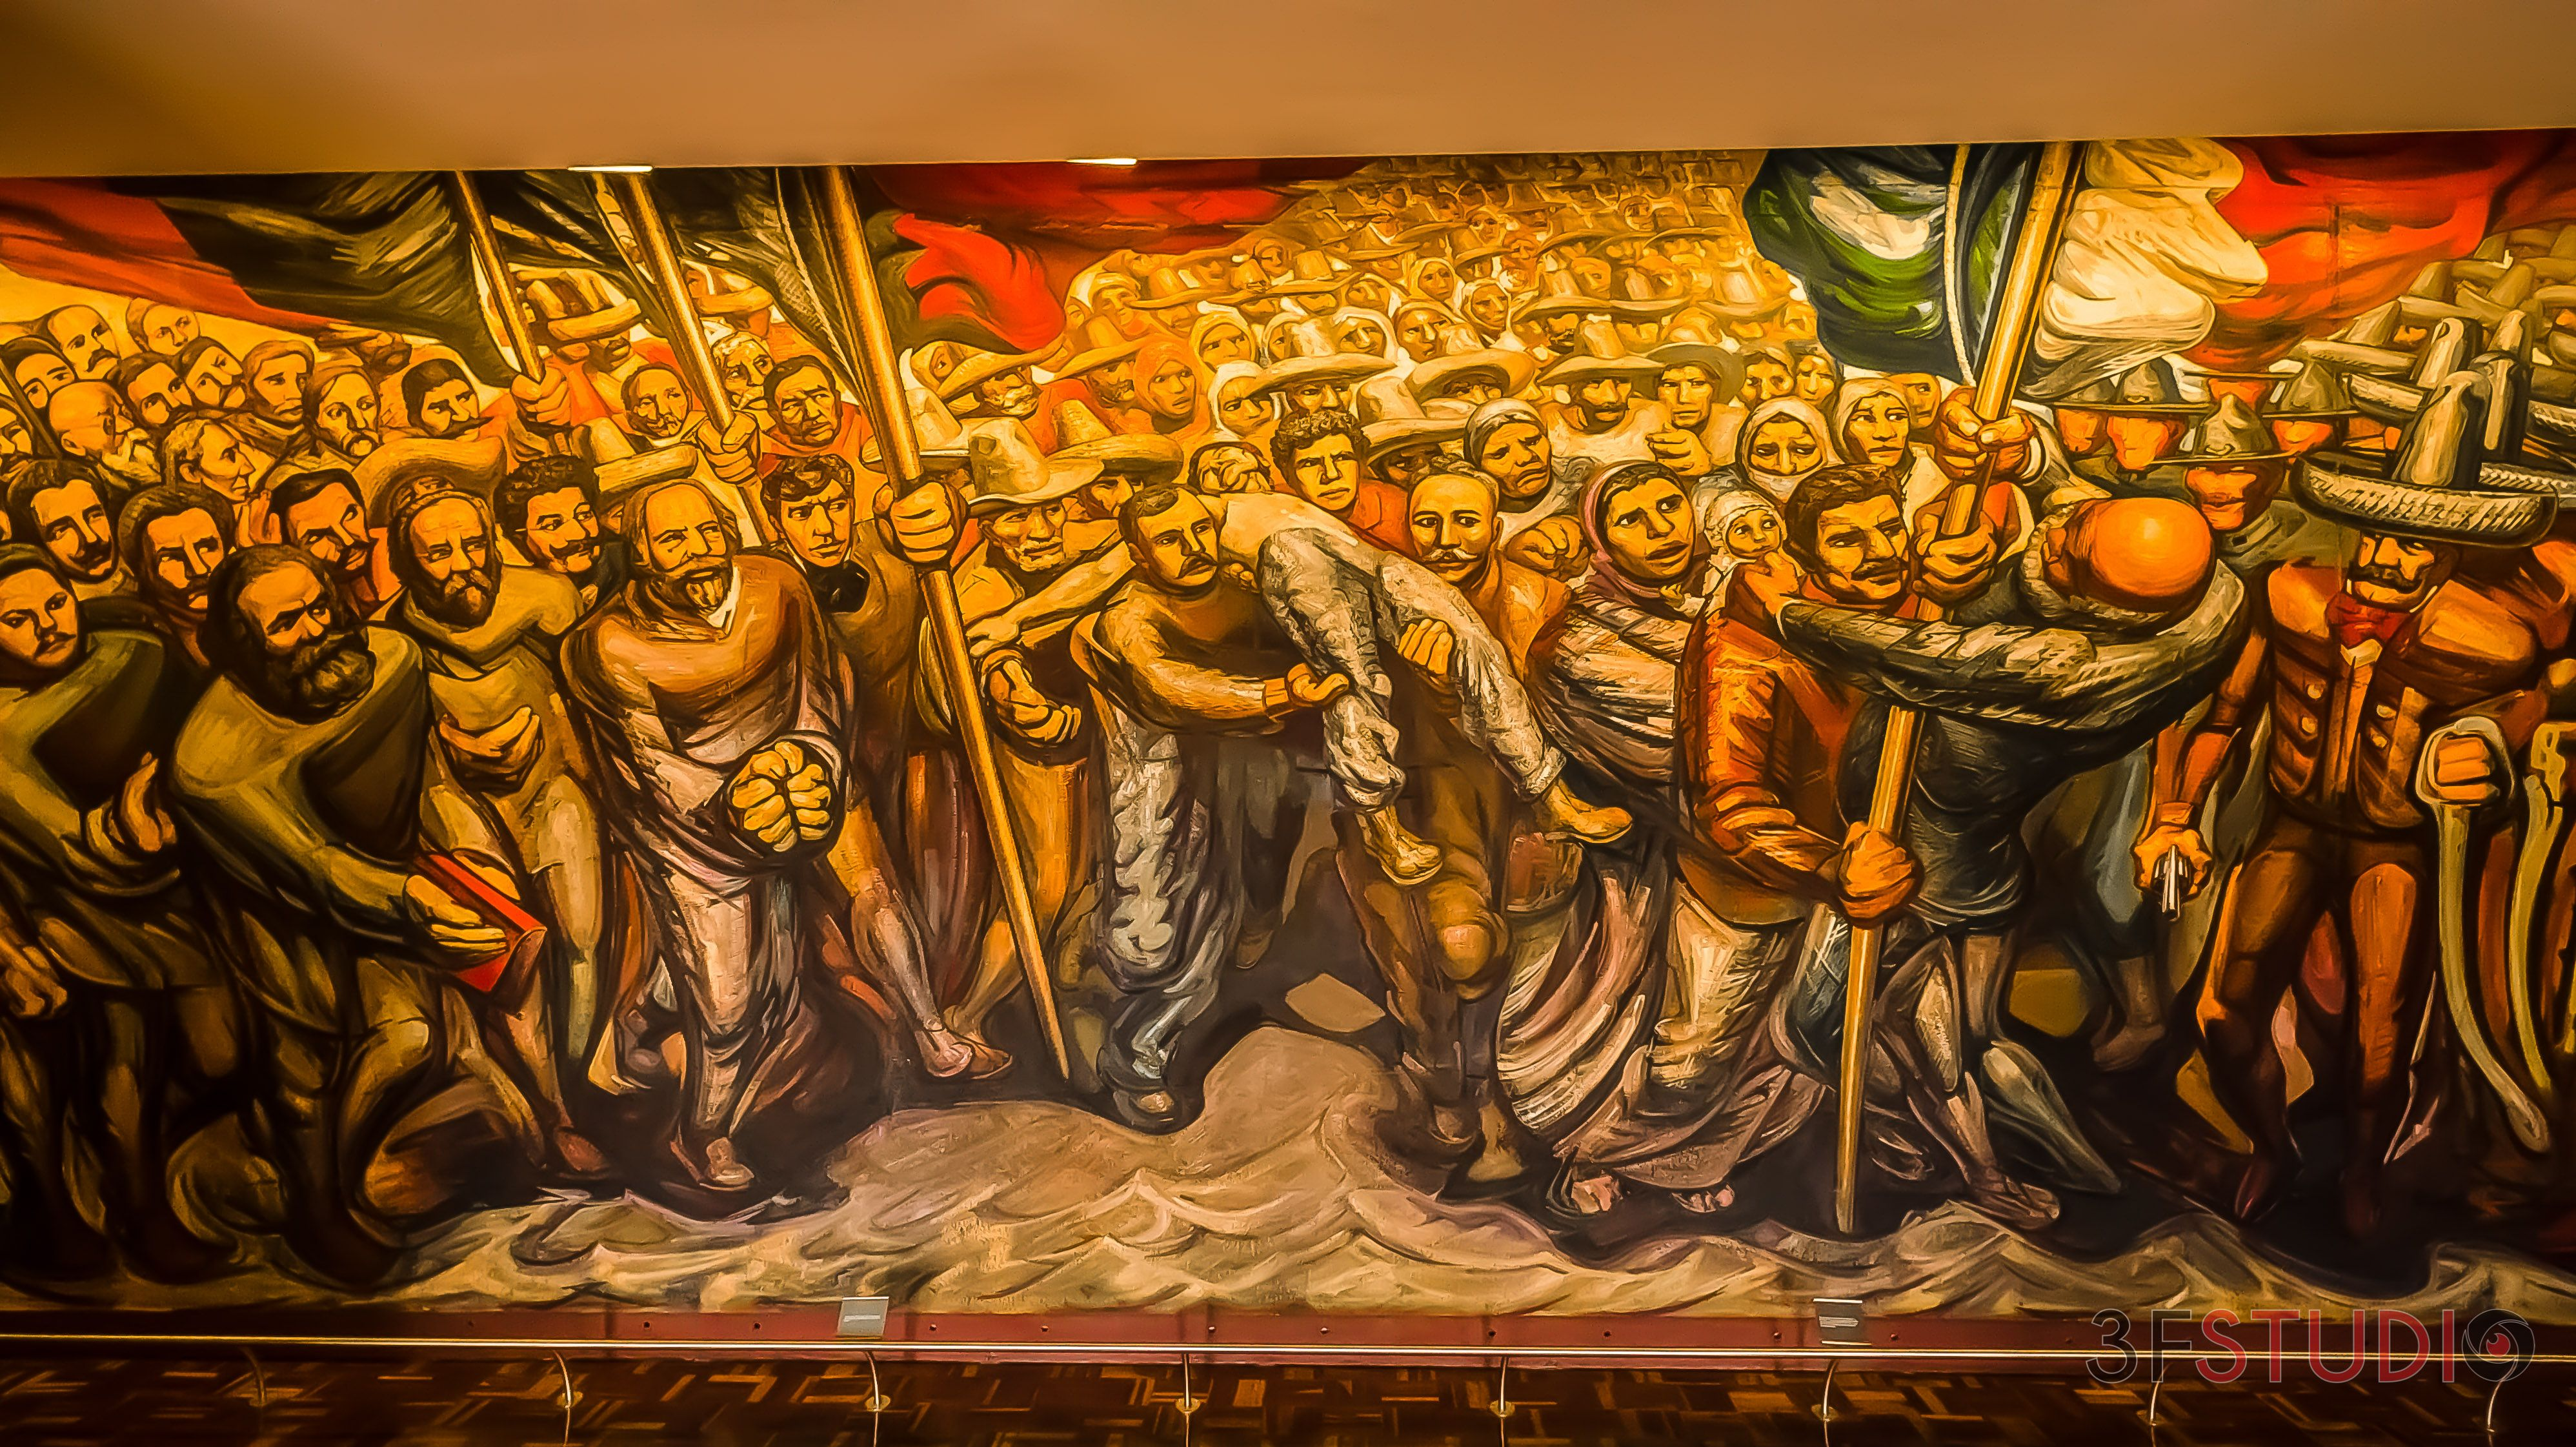 Mural Castillo De Chapultepec David Alfaro Siqueiros Con Imagenes